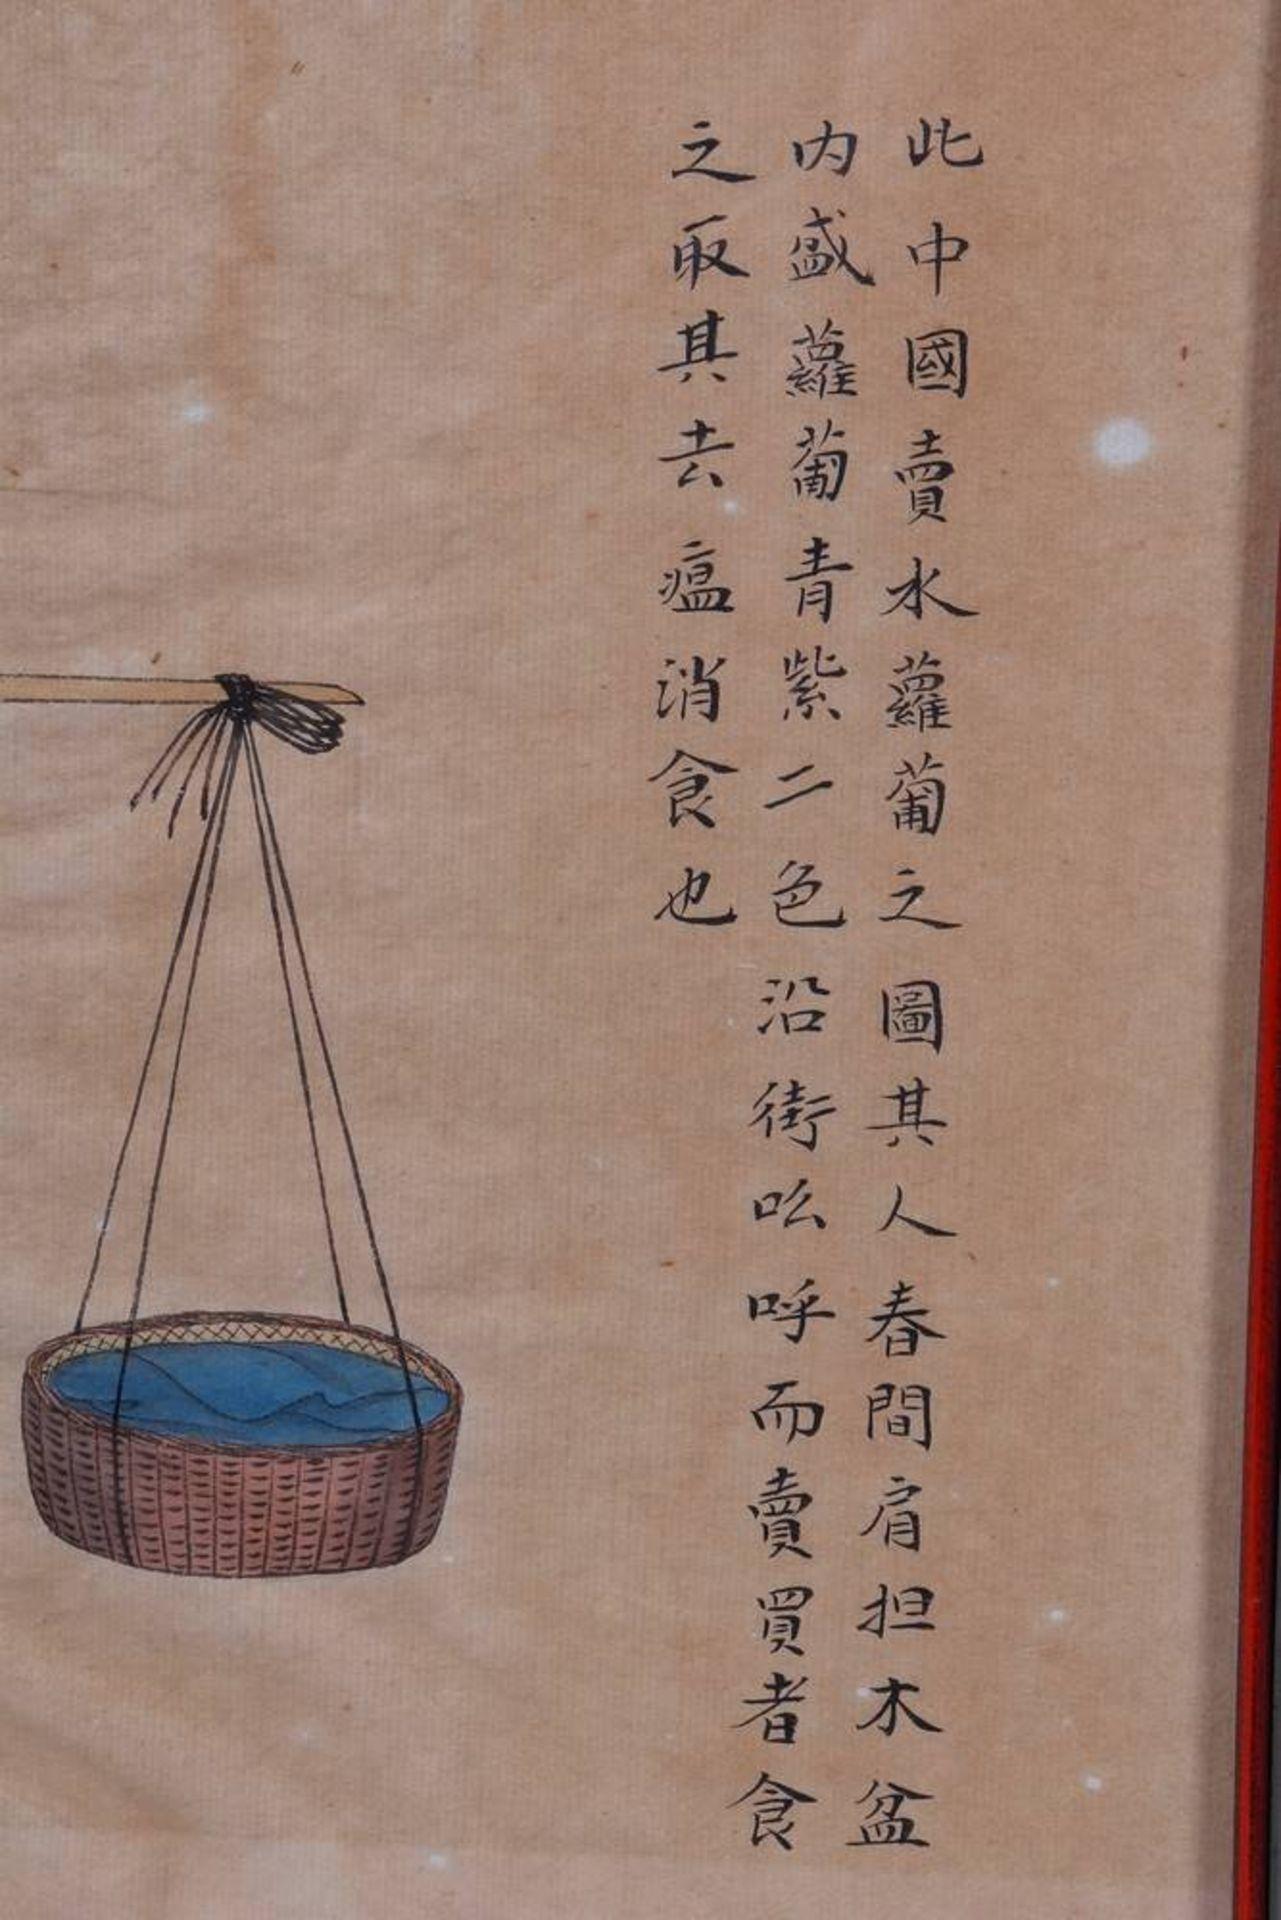 Zhou Peichun (China, tätig Ende 19.Jh./Anfang 20.Jh.) - Image 3 of 5